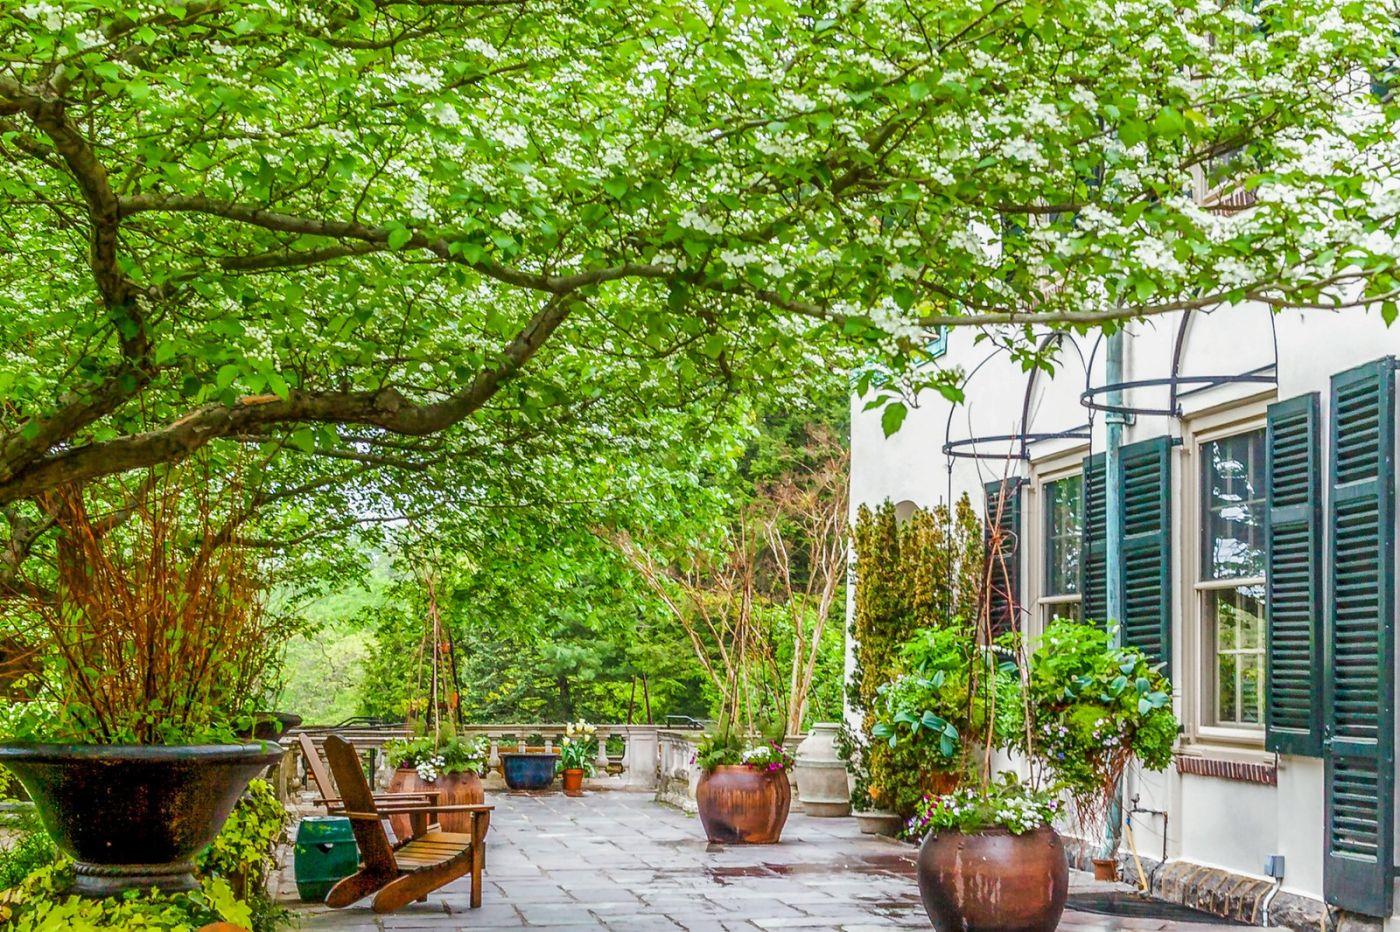 Chanticleer花园,一步一景_图1-20